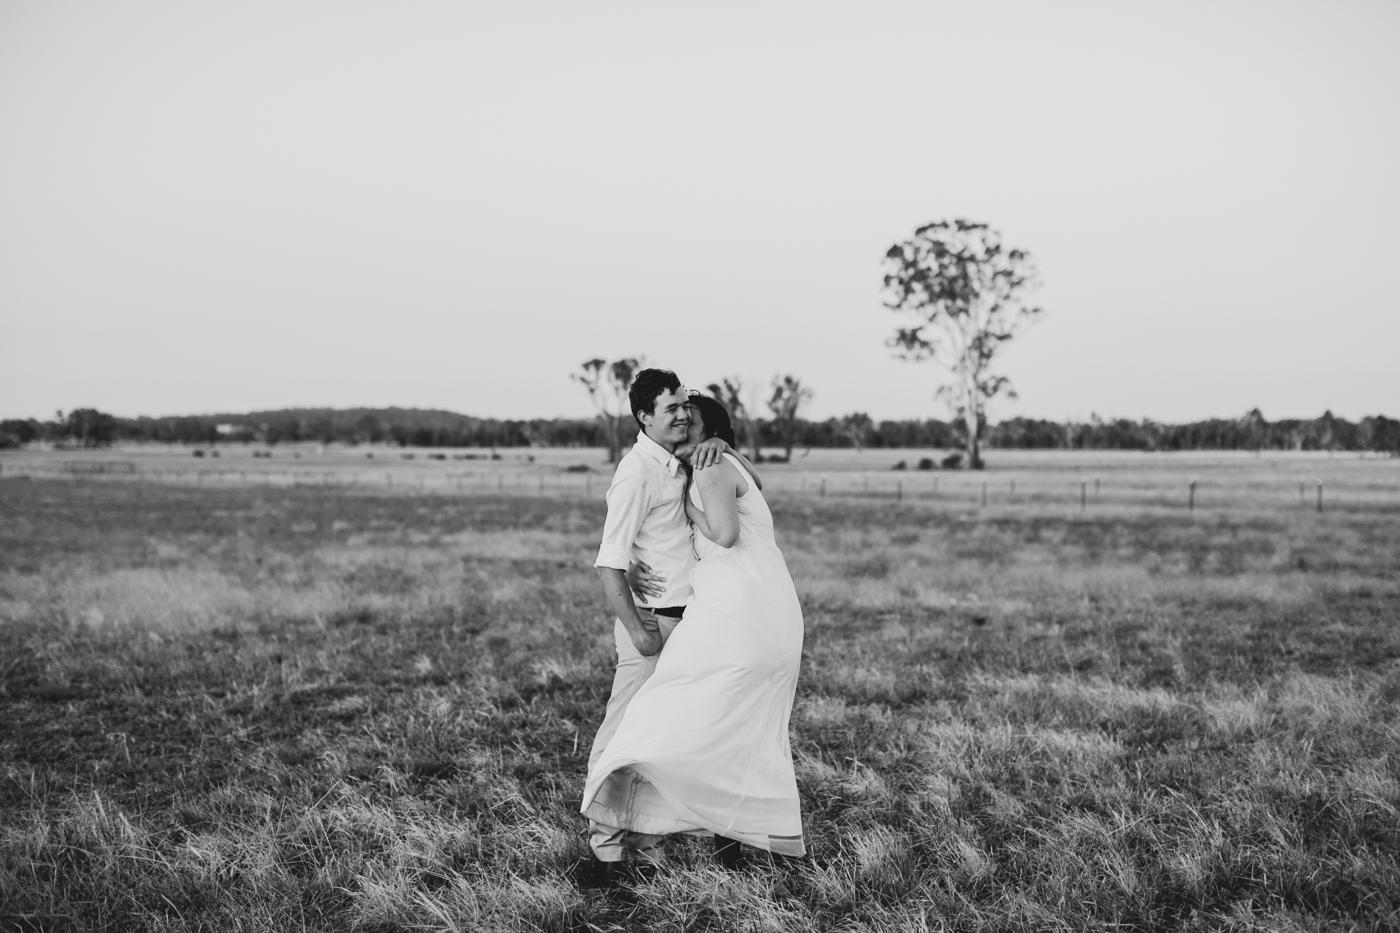 Nicolle & Jacob - Dubbo Wedding - Country Australia - Samantha Heather Photography-256.jpg